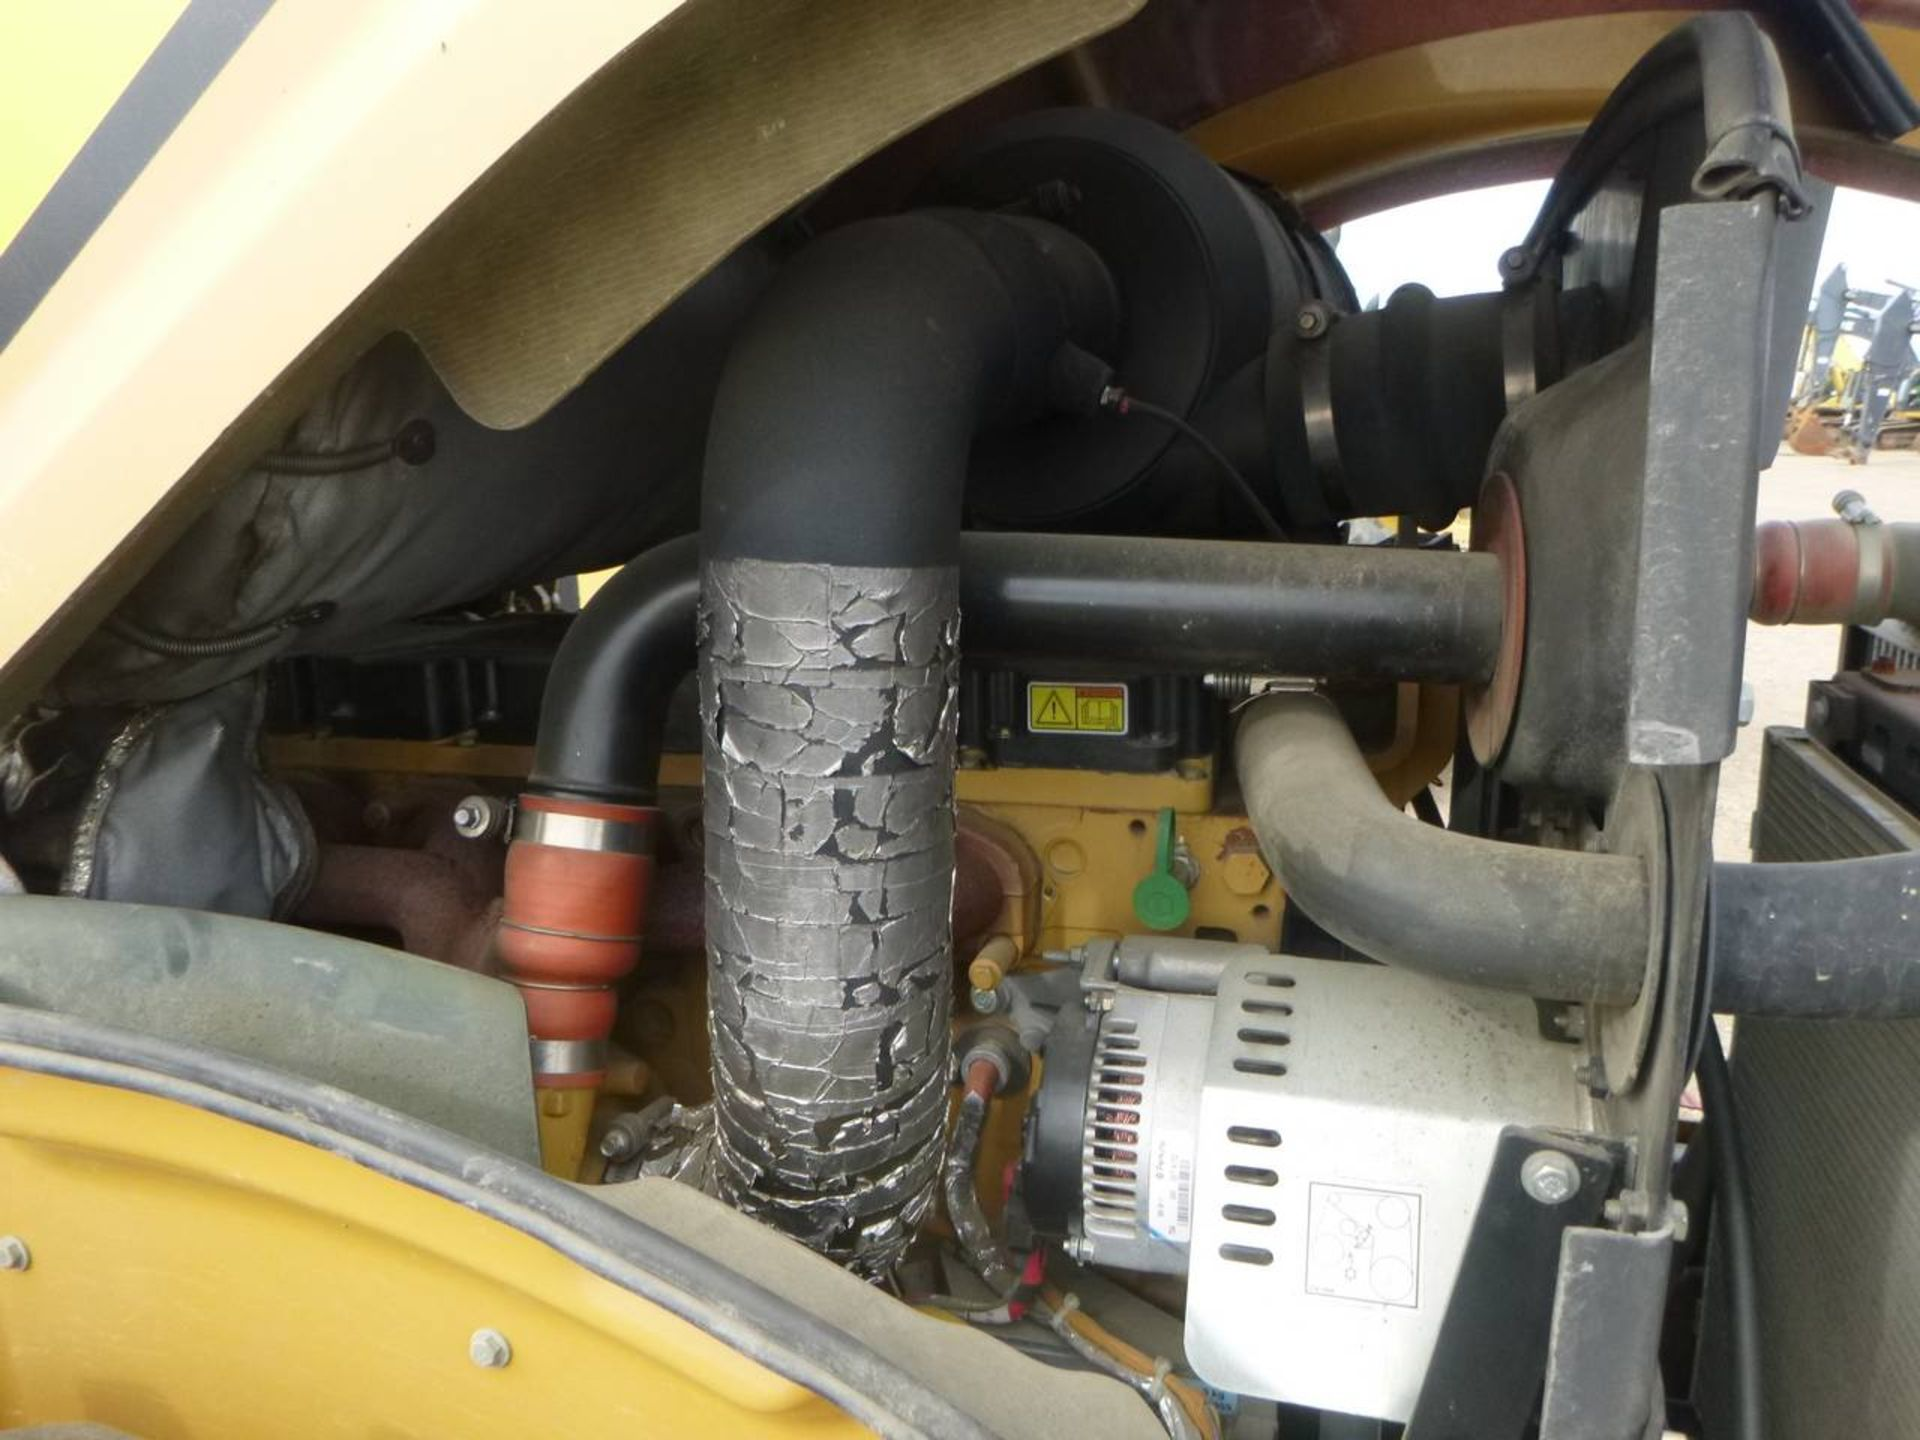 2009 Caterpillar CP56 Compactor - Image 6 of 9